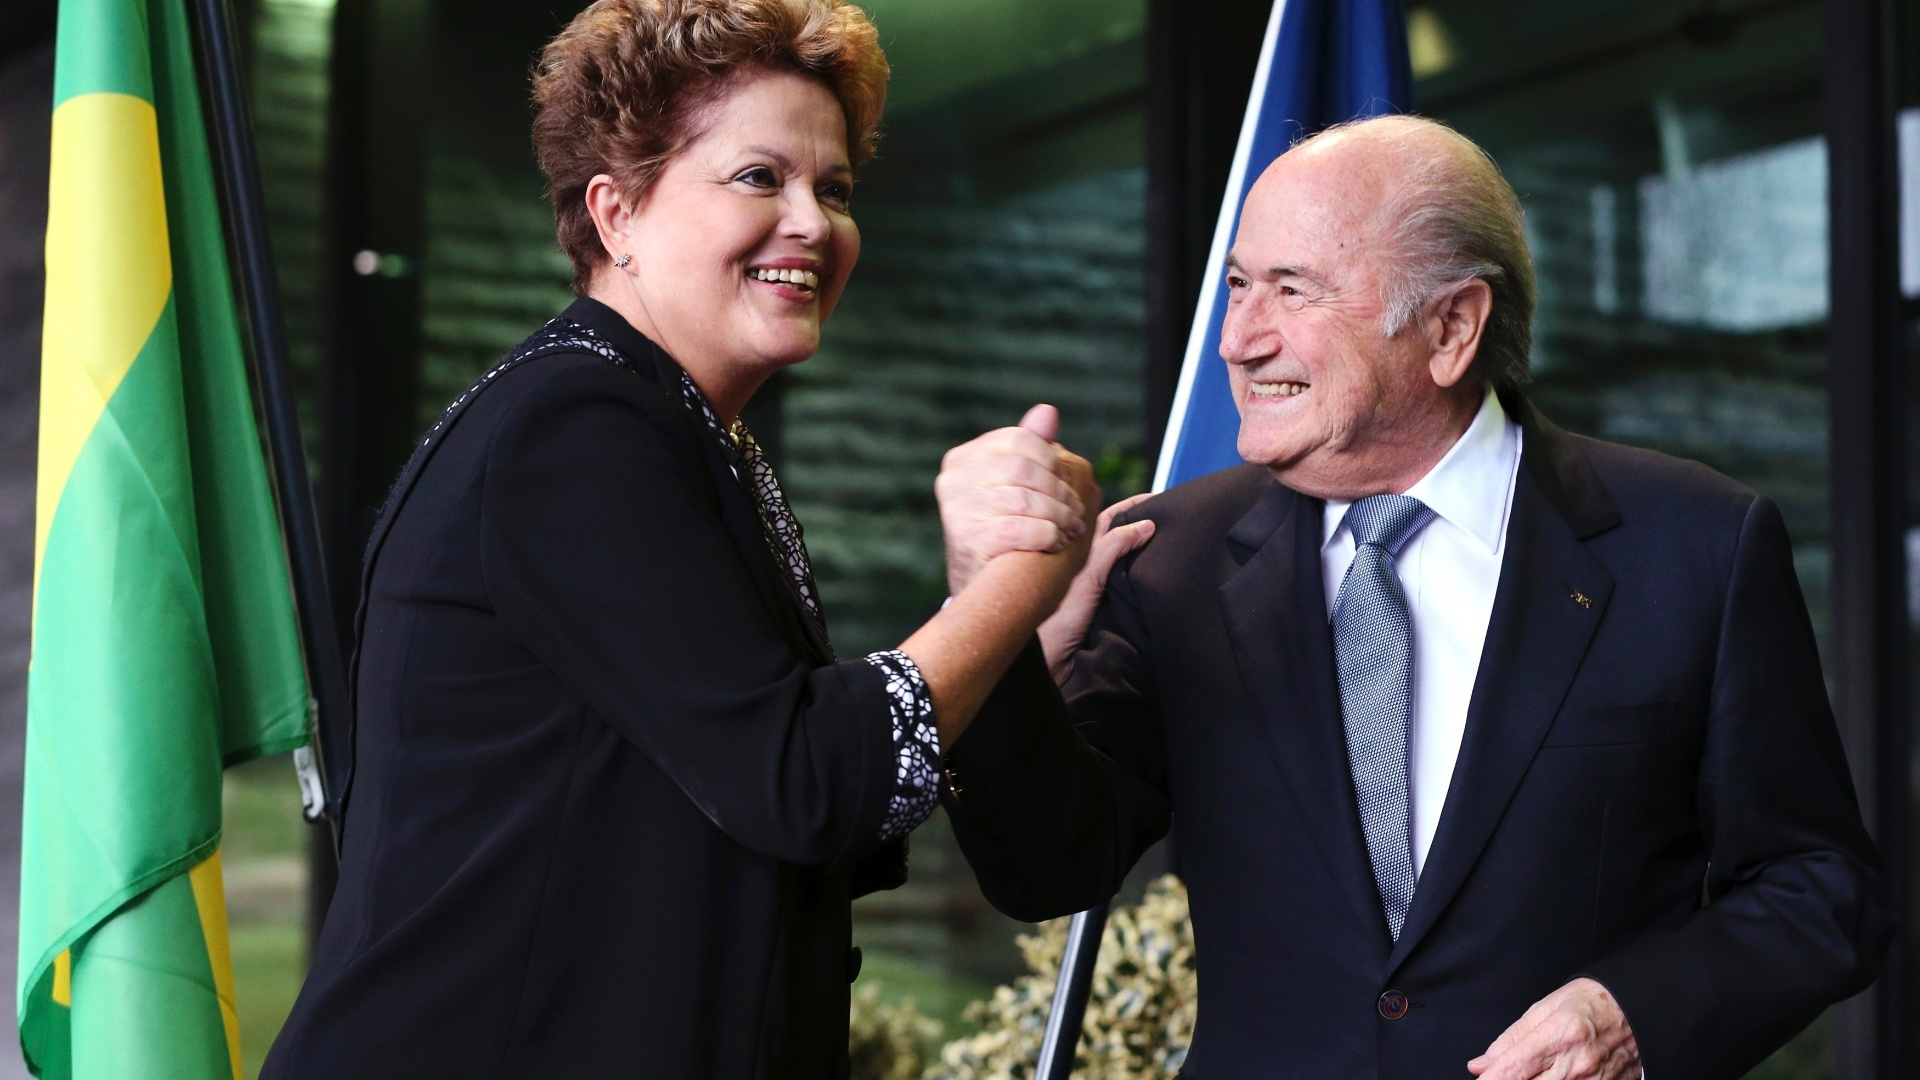 23.jan.2014 - A presidente Dilma Rousseff cumprimenta o presidente da Fifa, Joseph Blatter, durante uma visita à sede da entidade, nesta quarta-feira (23)